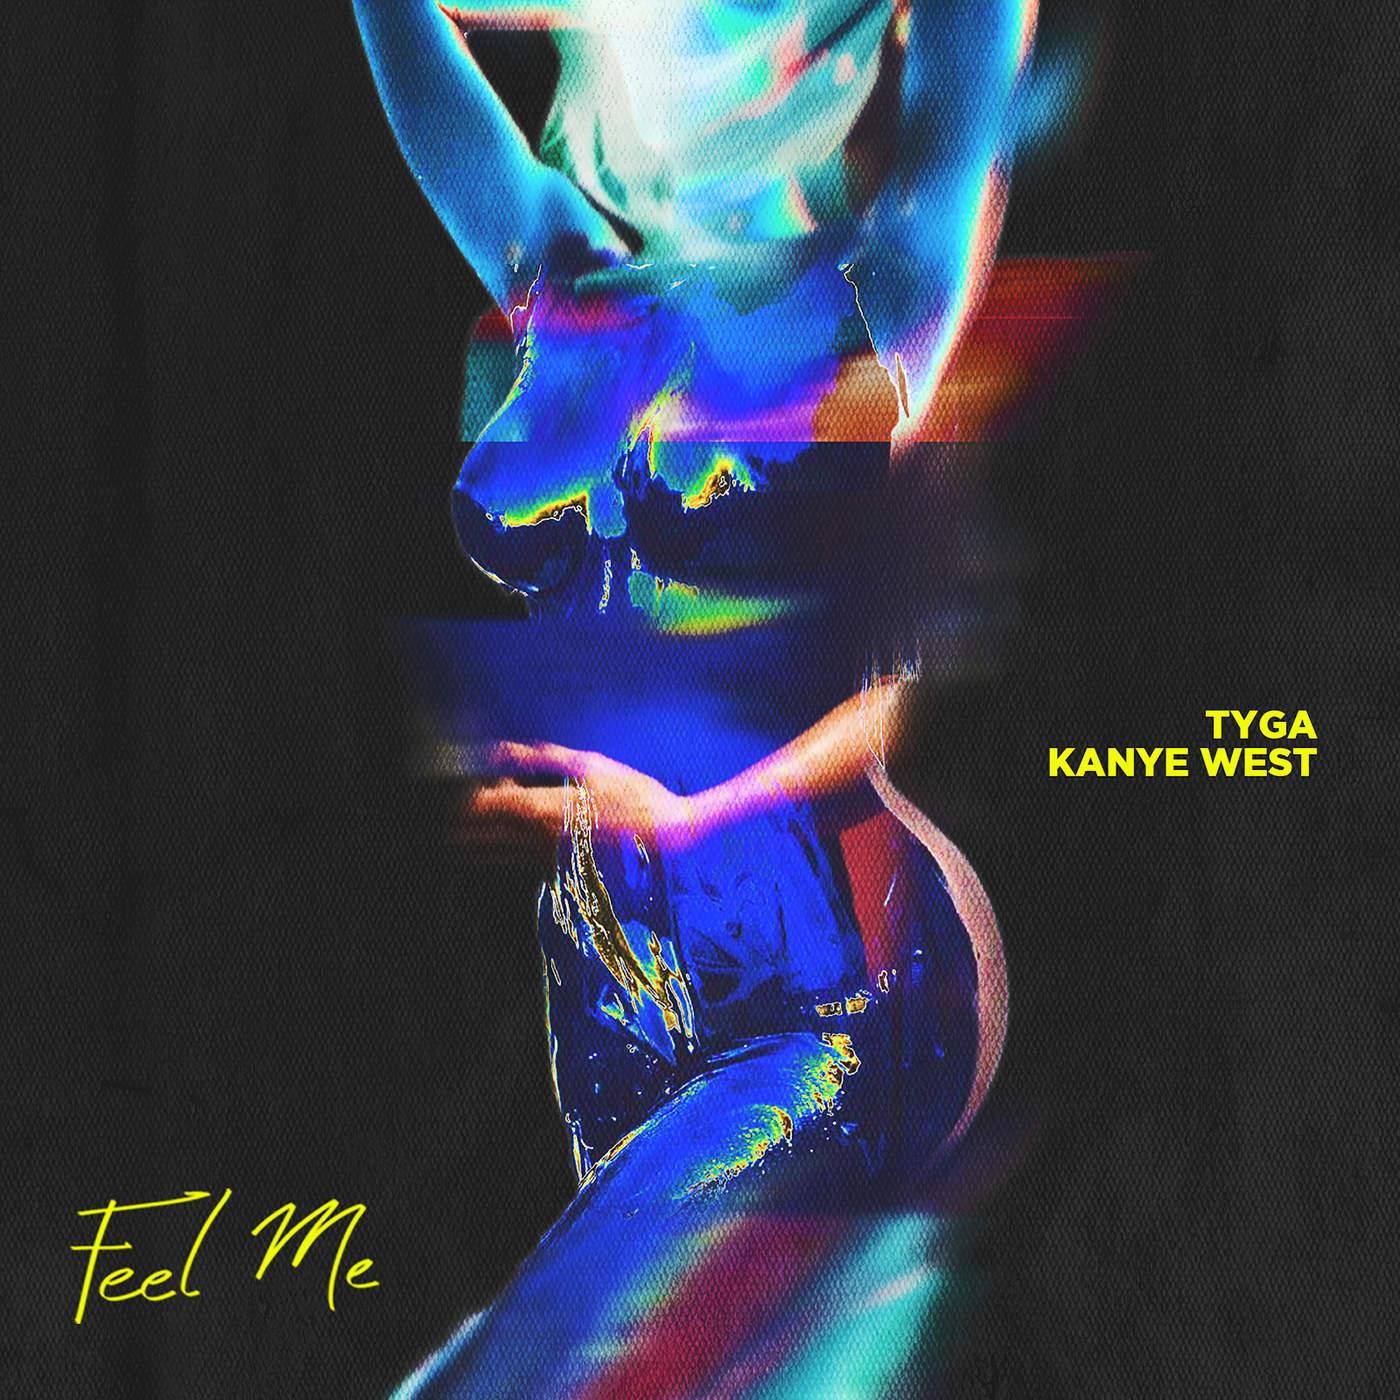 Tyga - Feel Me (feat. Kanye West) - Single Cover